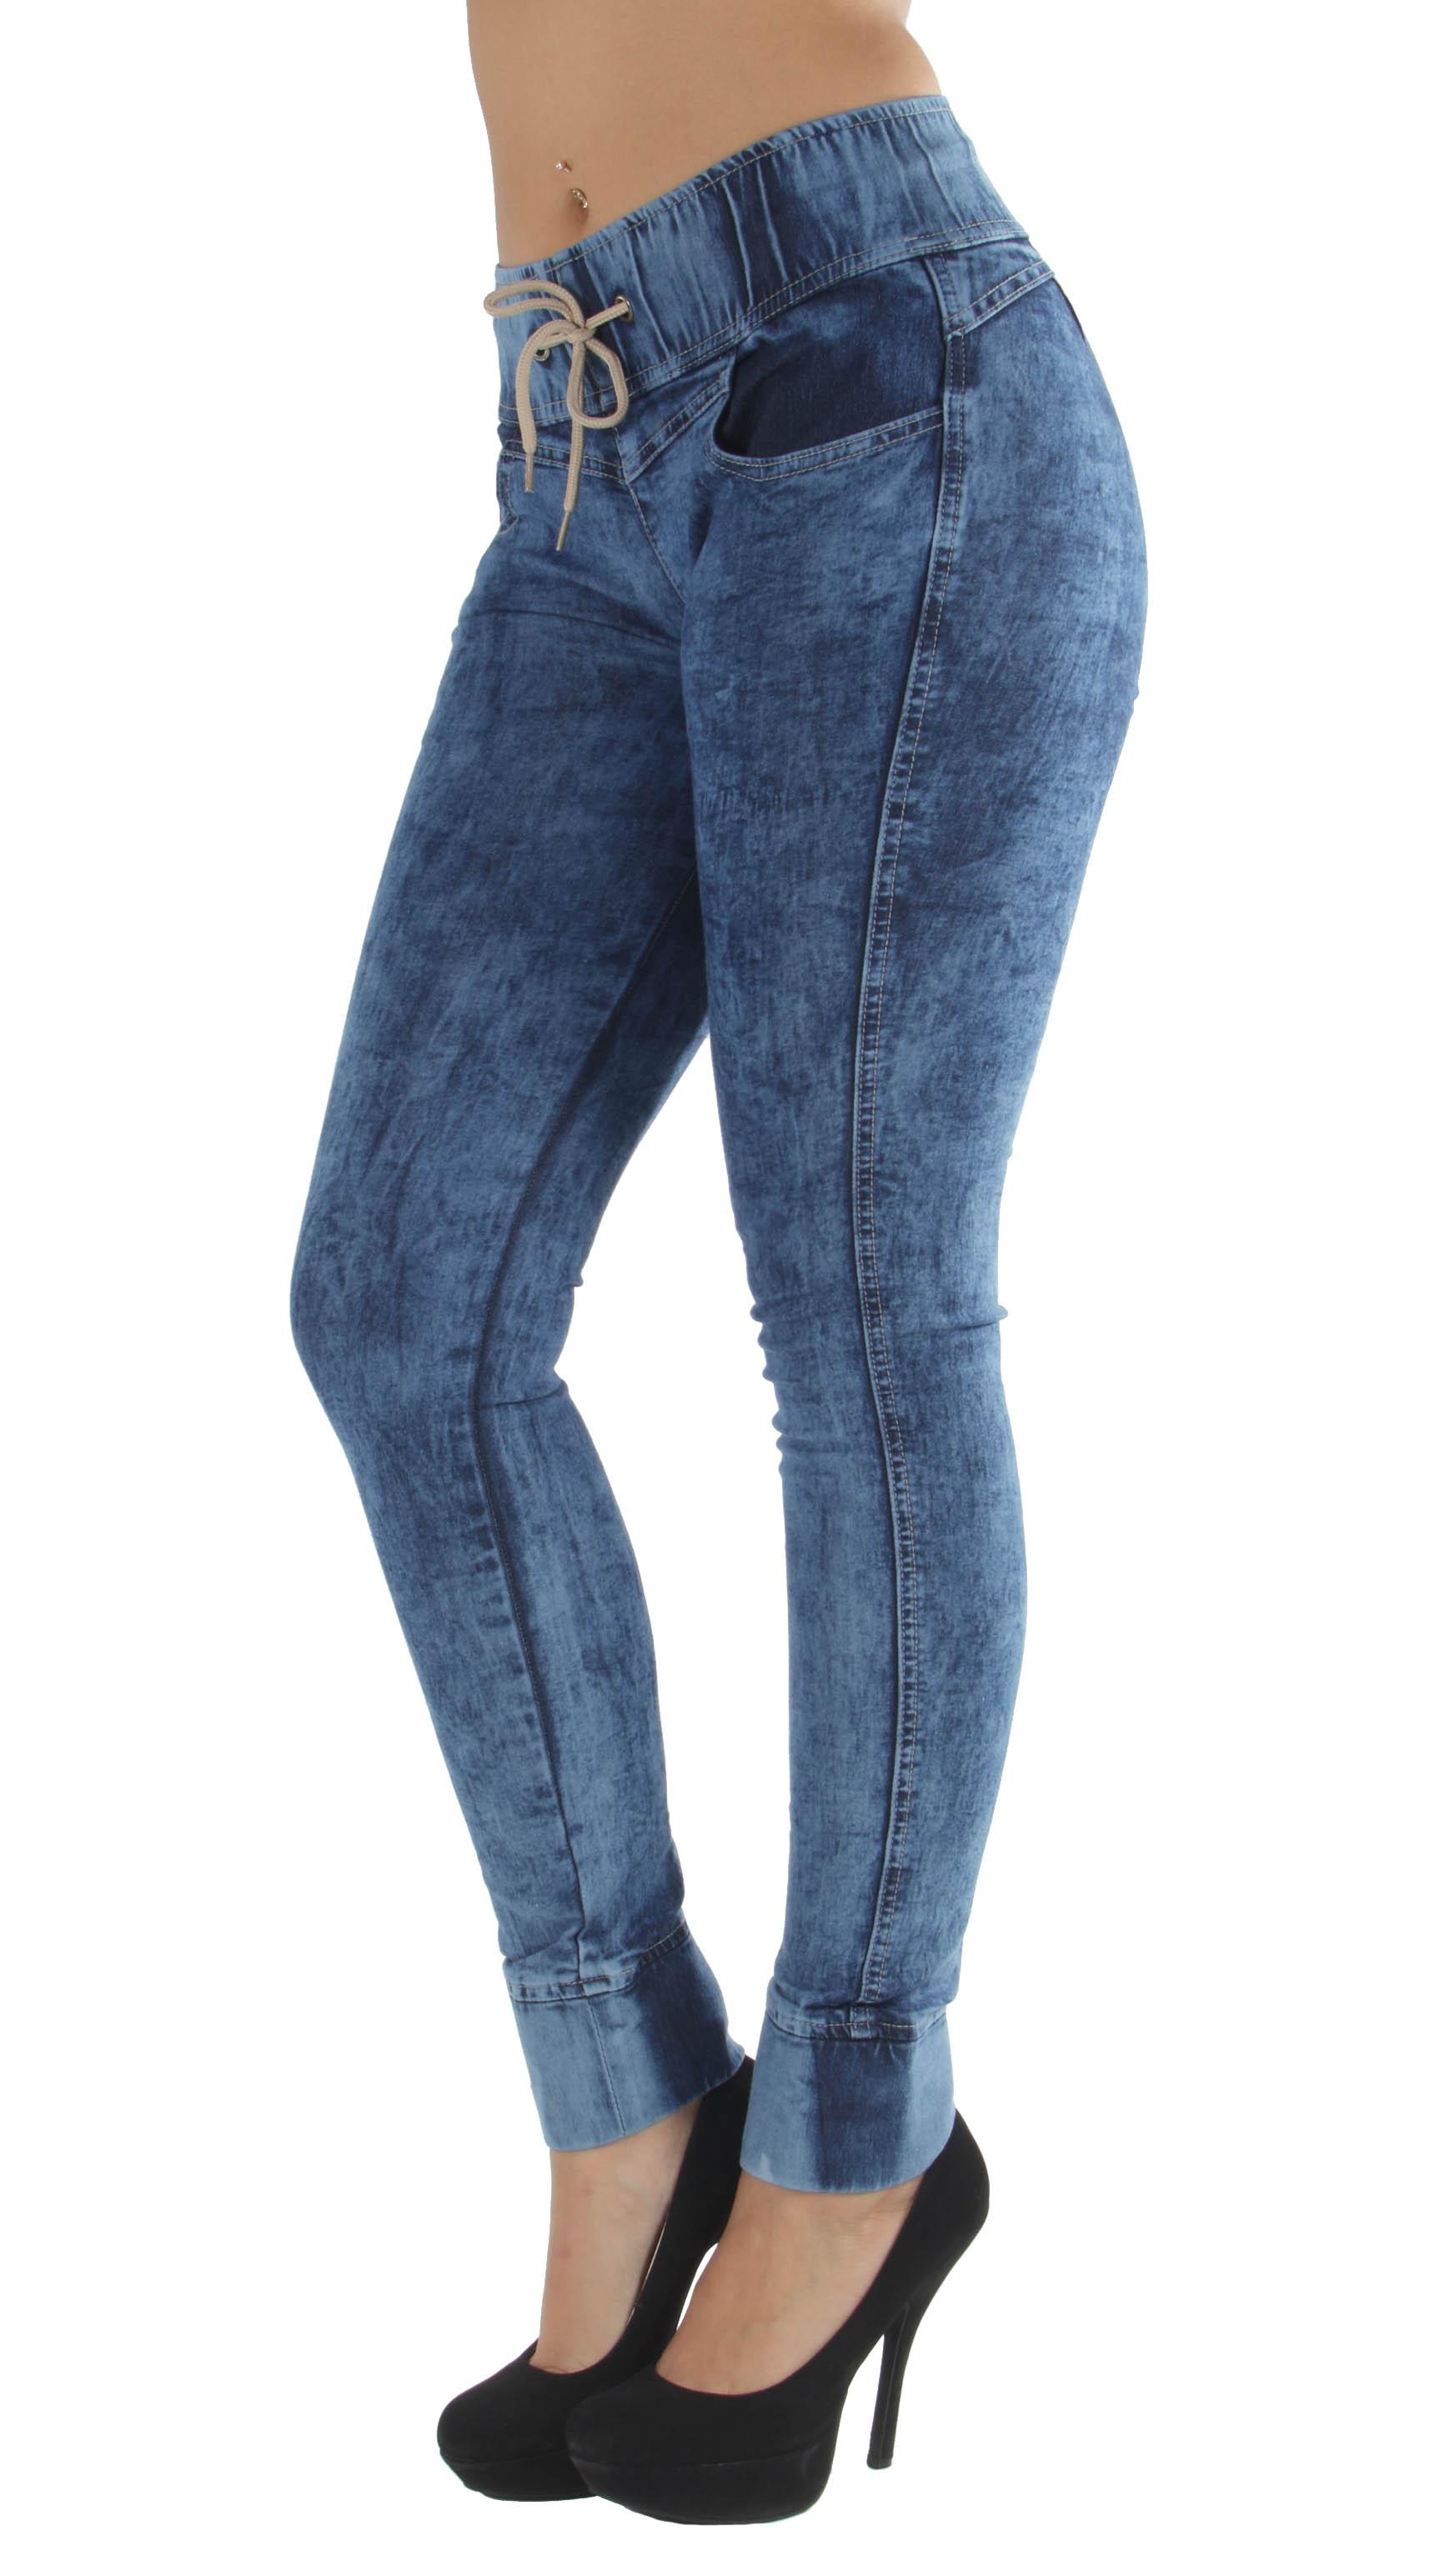 N967-Colombian-Design-Butt-Lifting-Levanta-Cola-Elastic-Waist-Skinny-Jeans